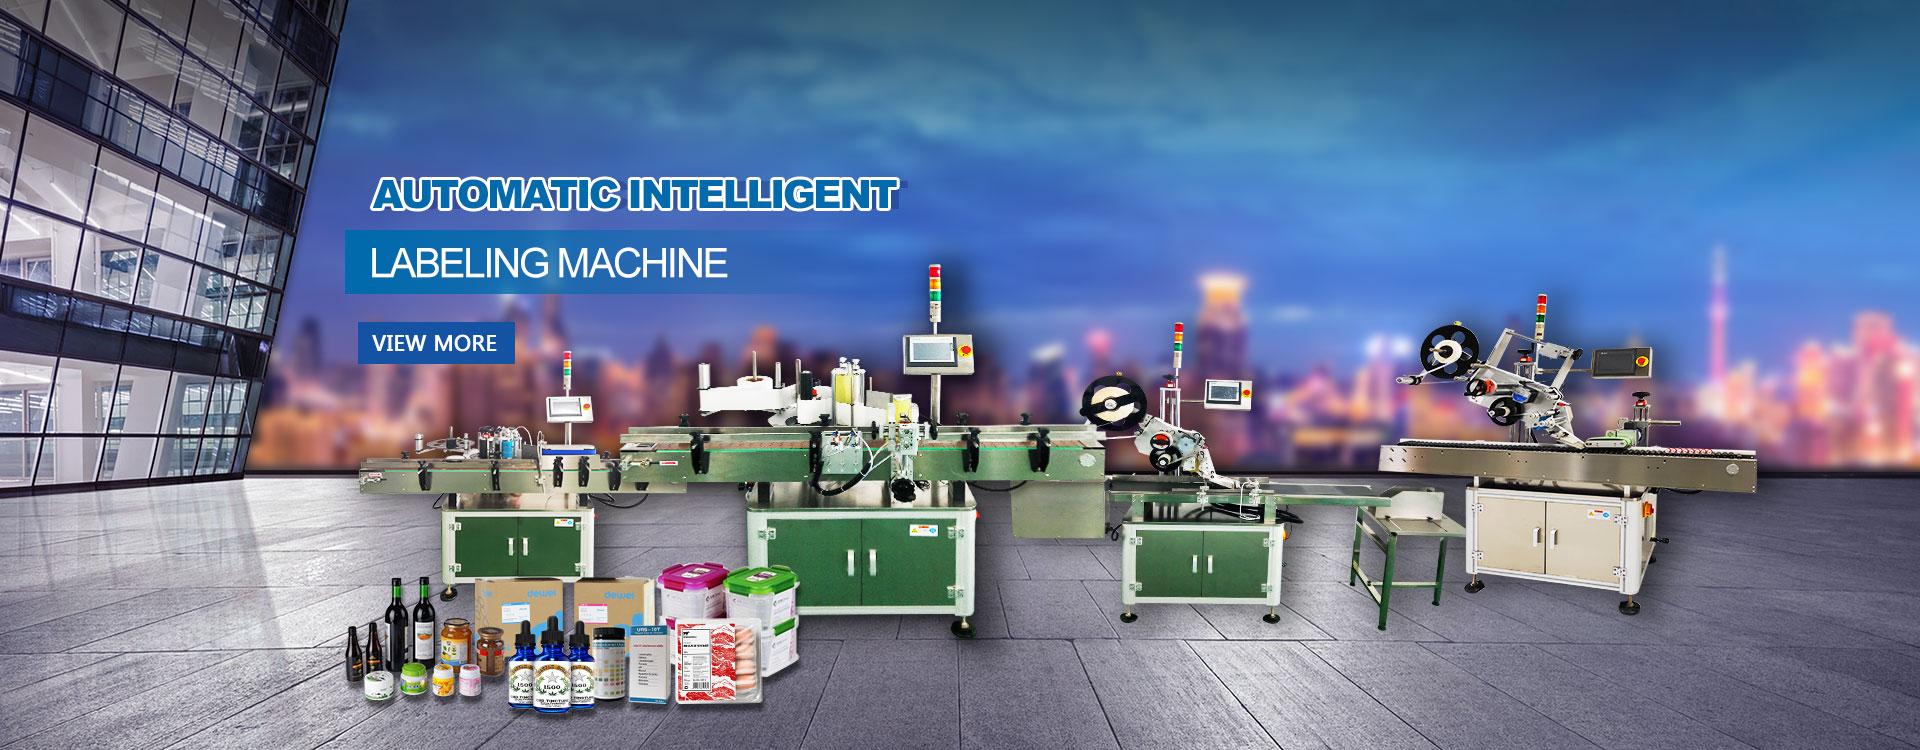 Automatic Intelligent Labeling Machine